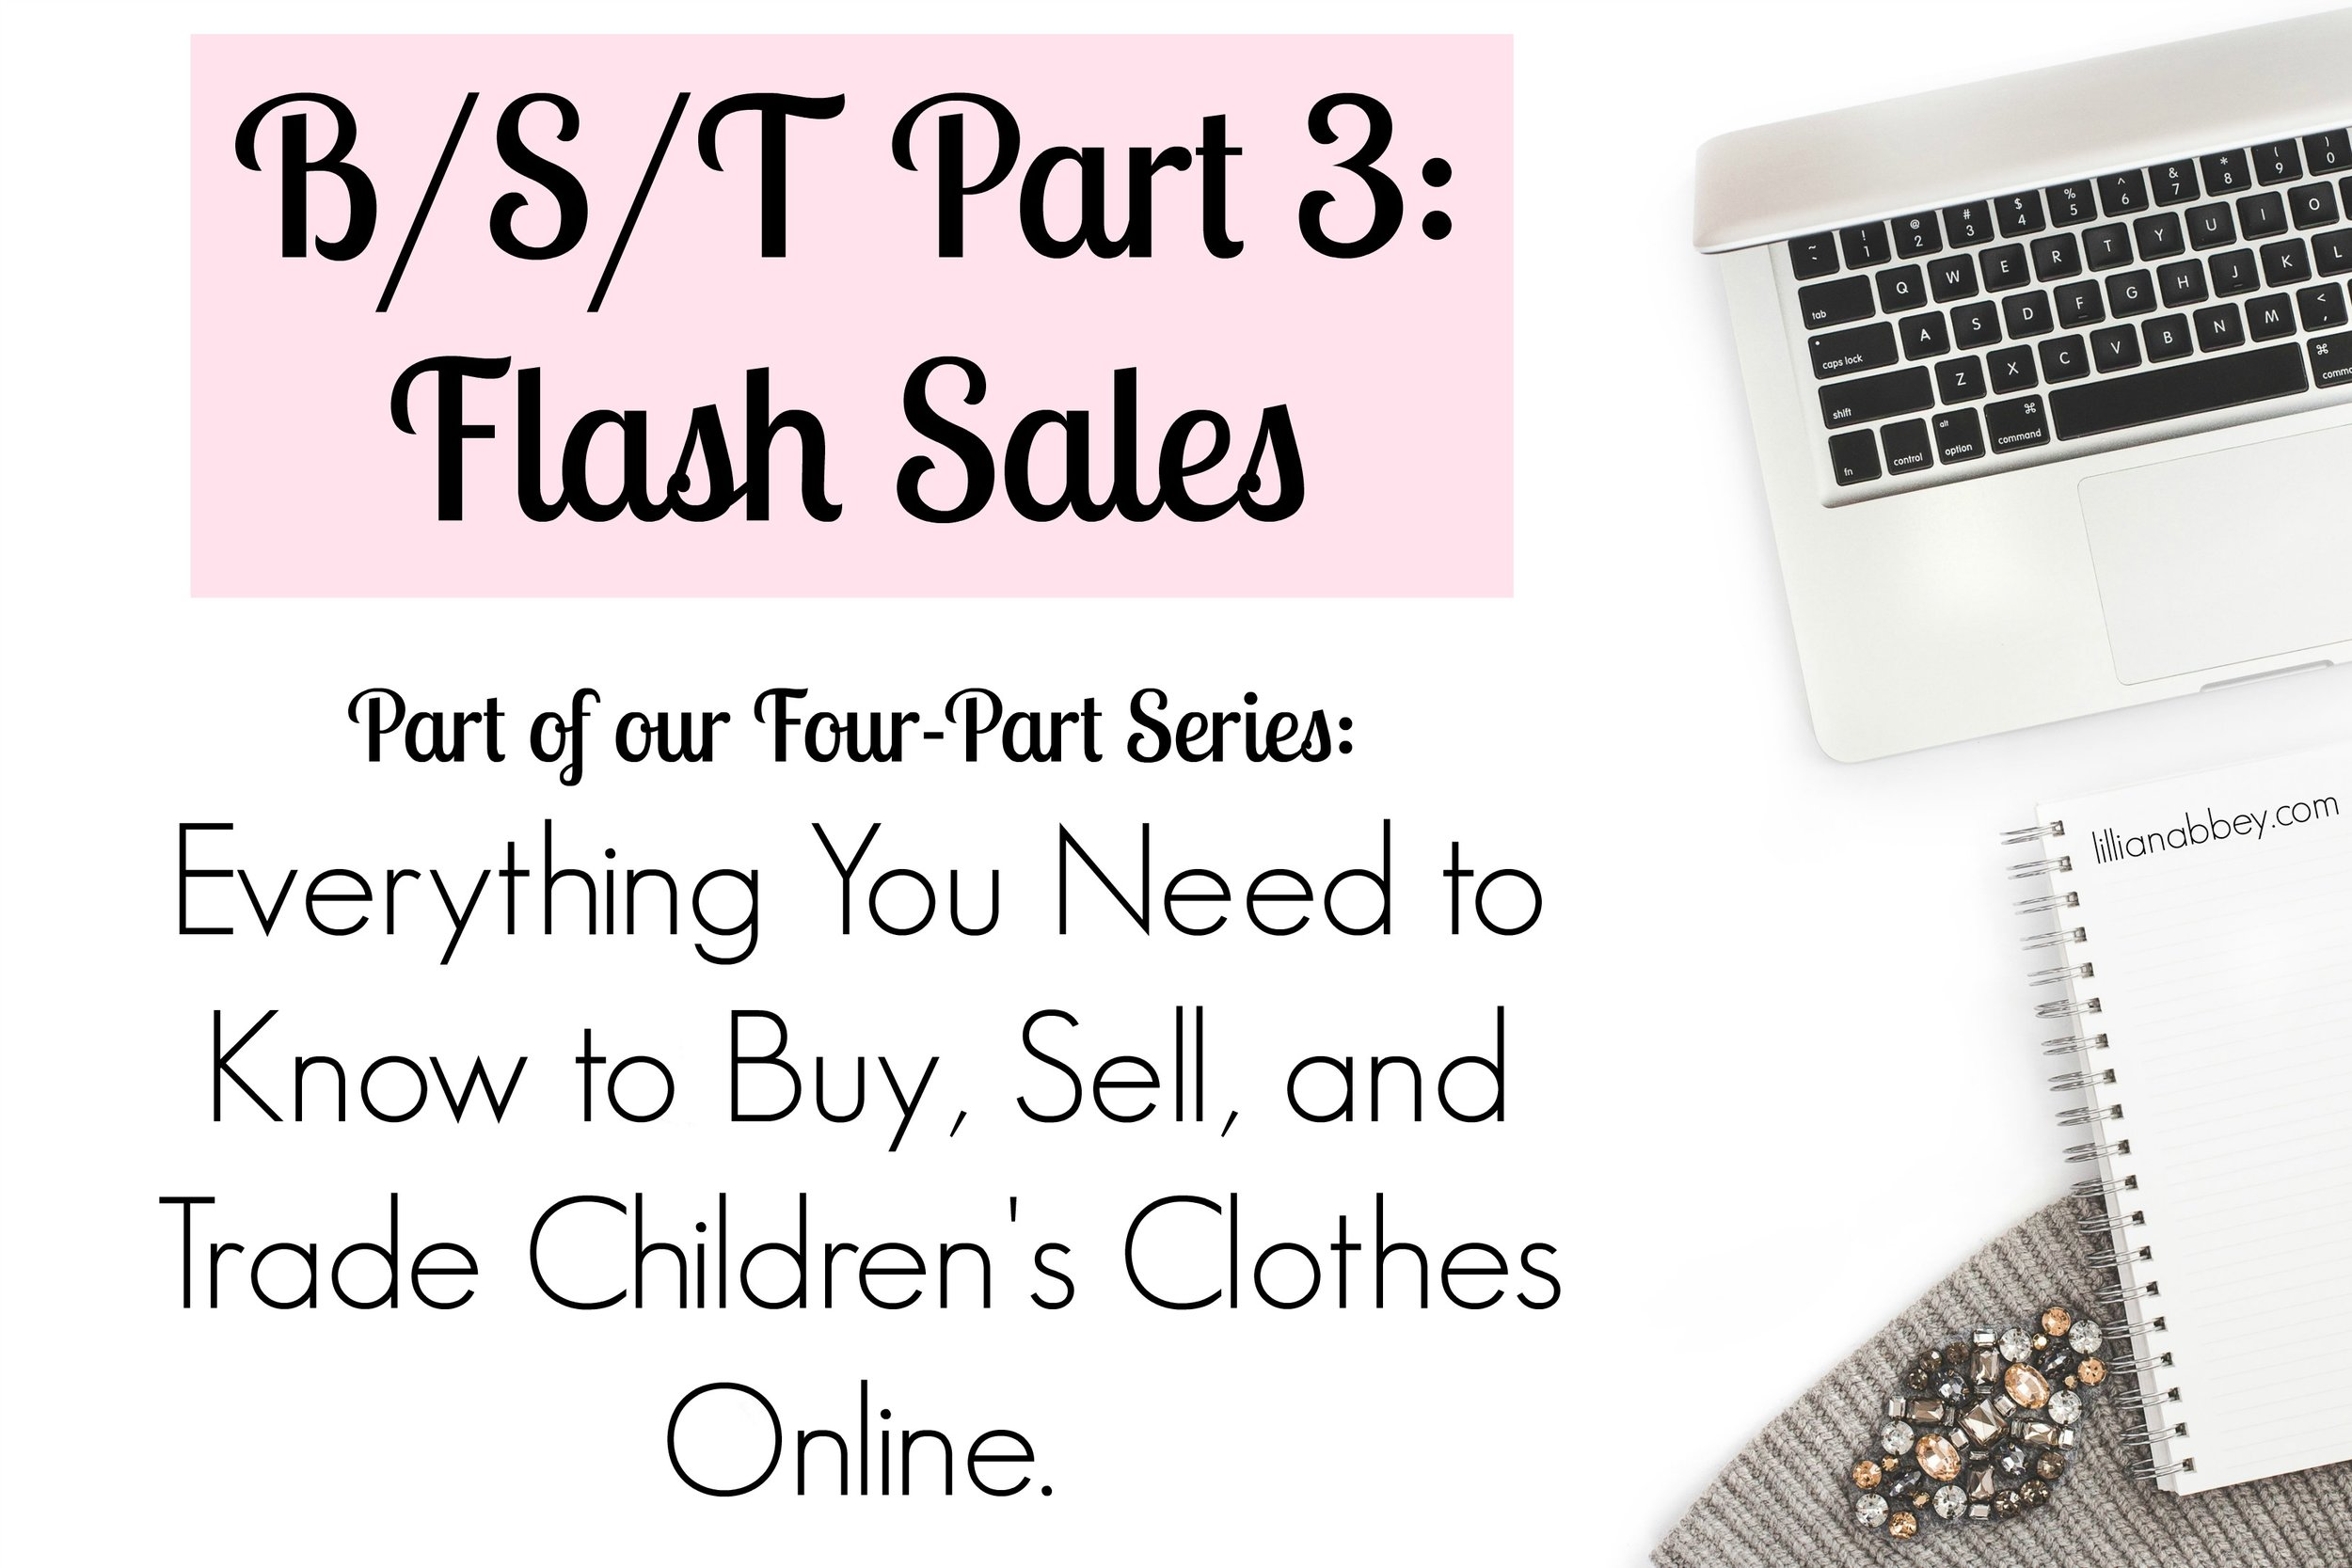 B/S/T Part 3: Flash Sales